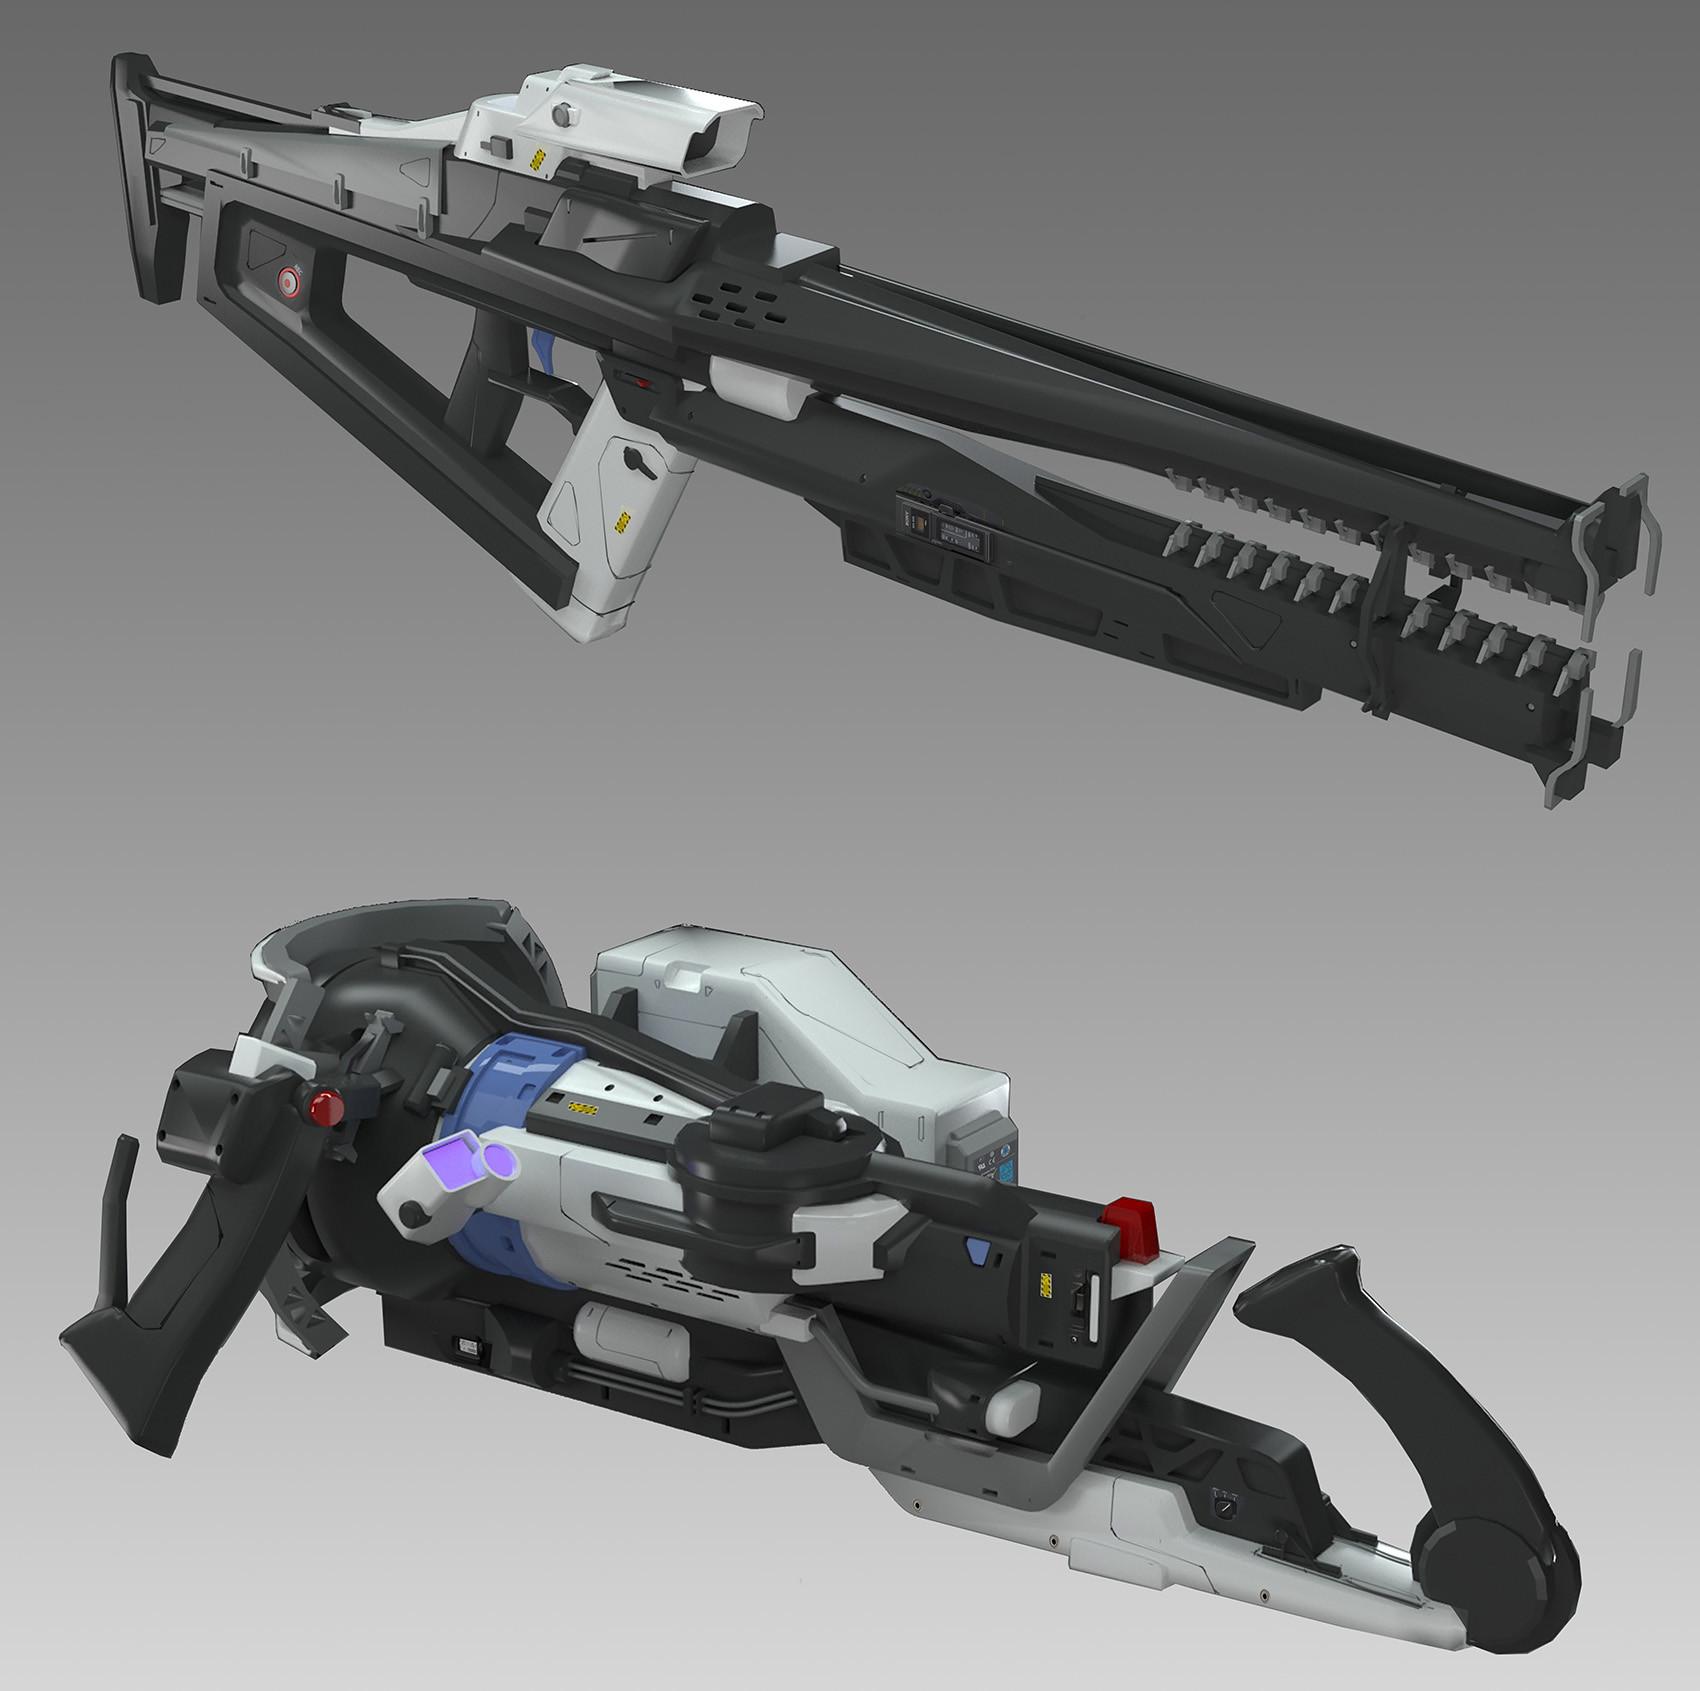 Chen liang weapon 02